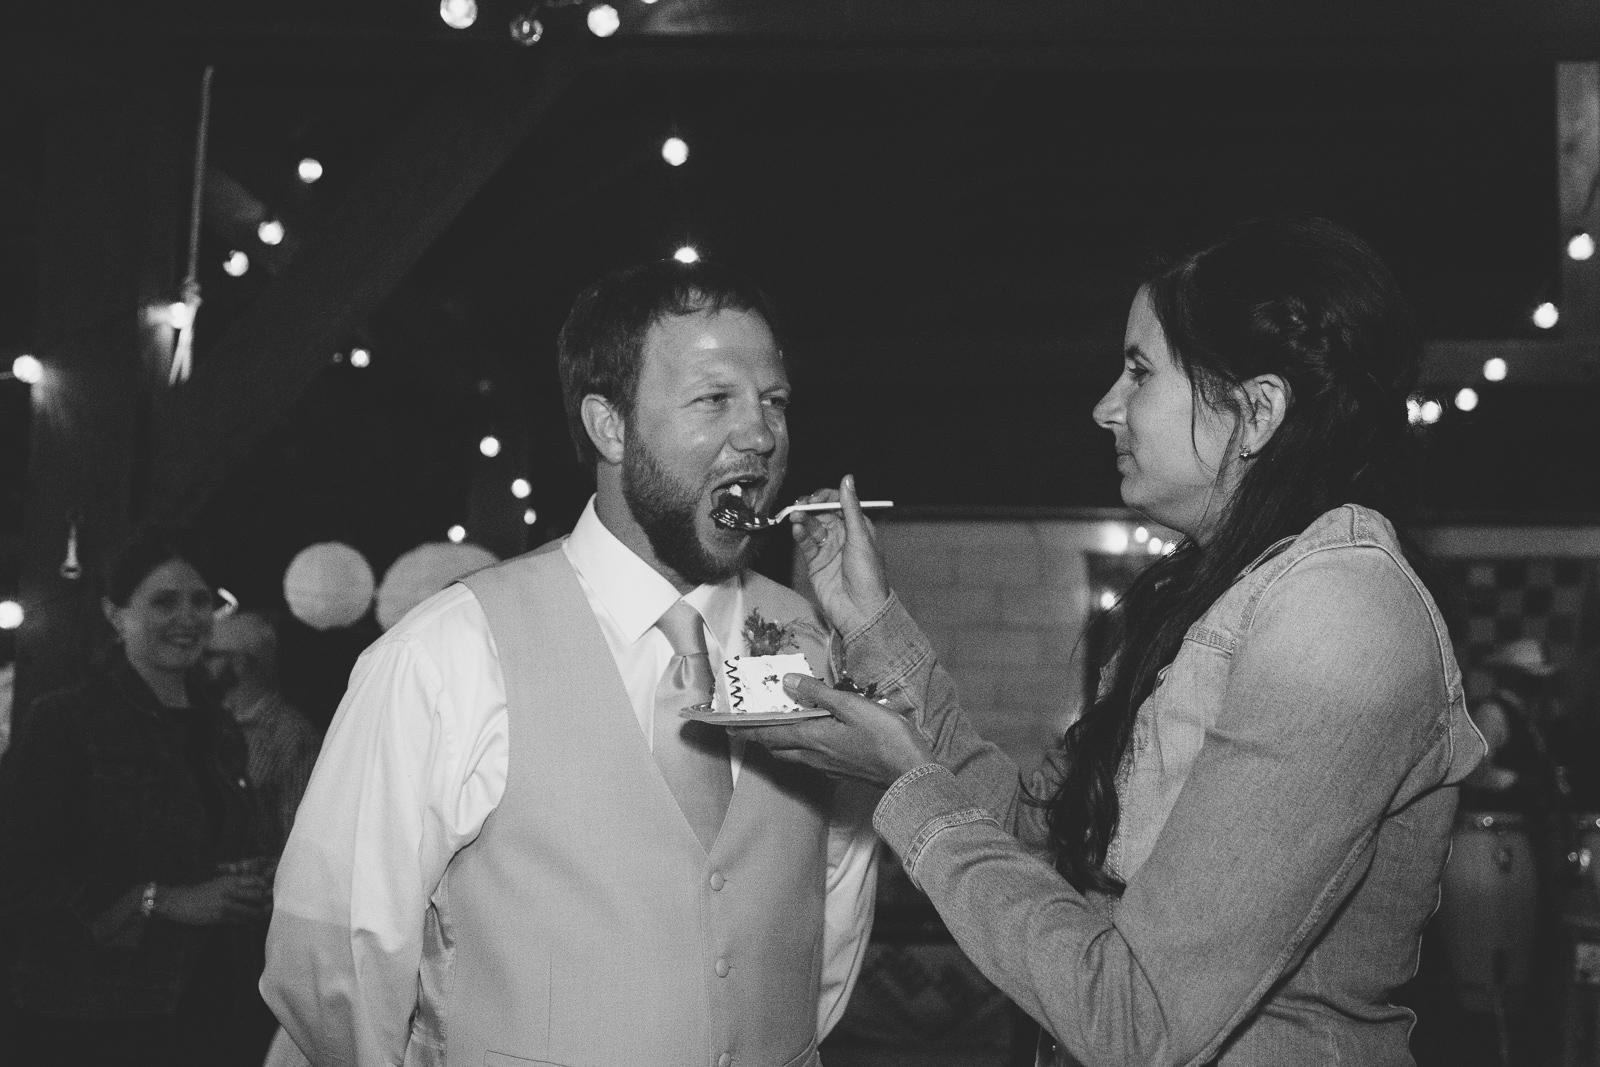 188-wedding-fun-photography-reception-unique-nature-trees-dancing